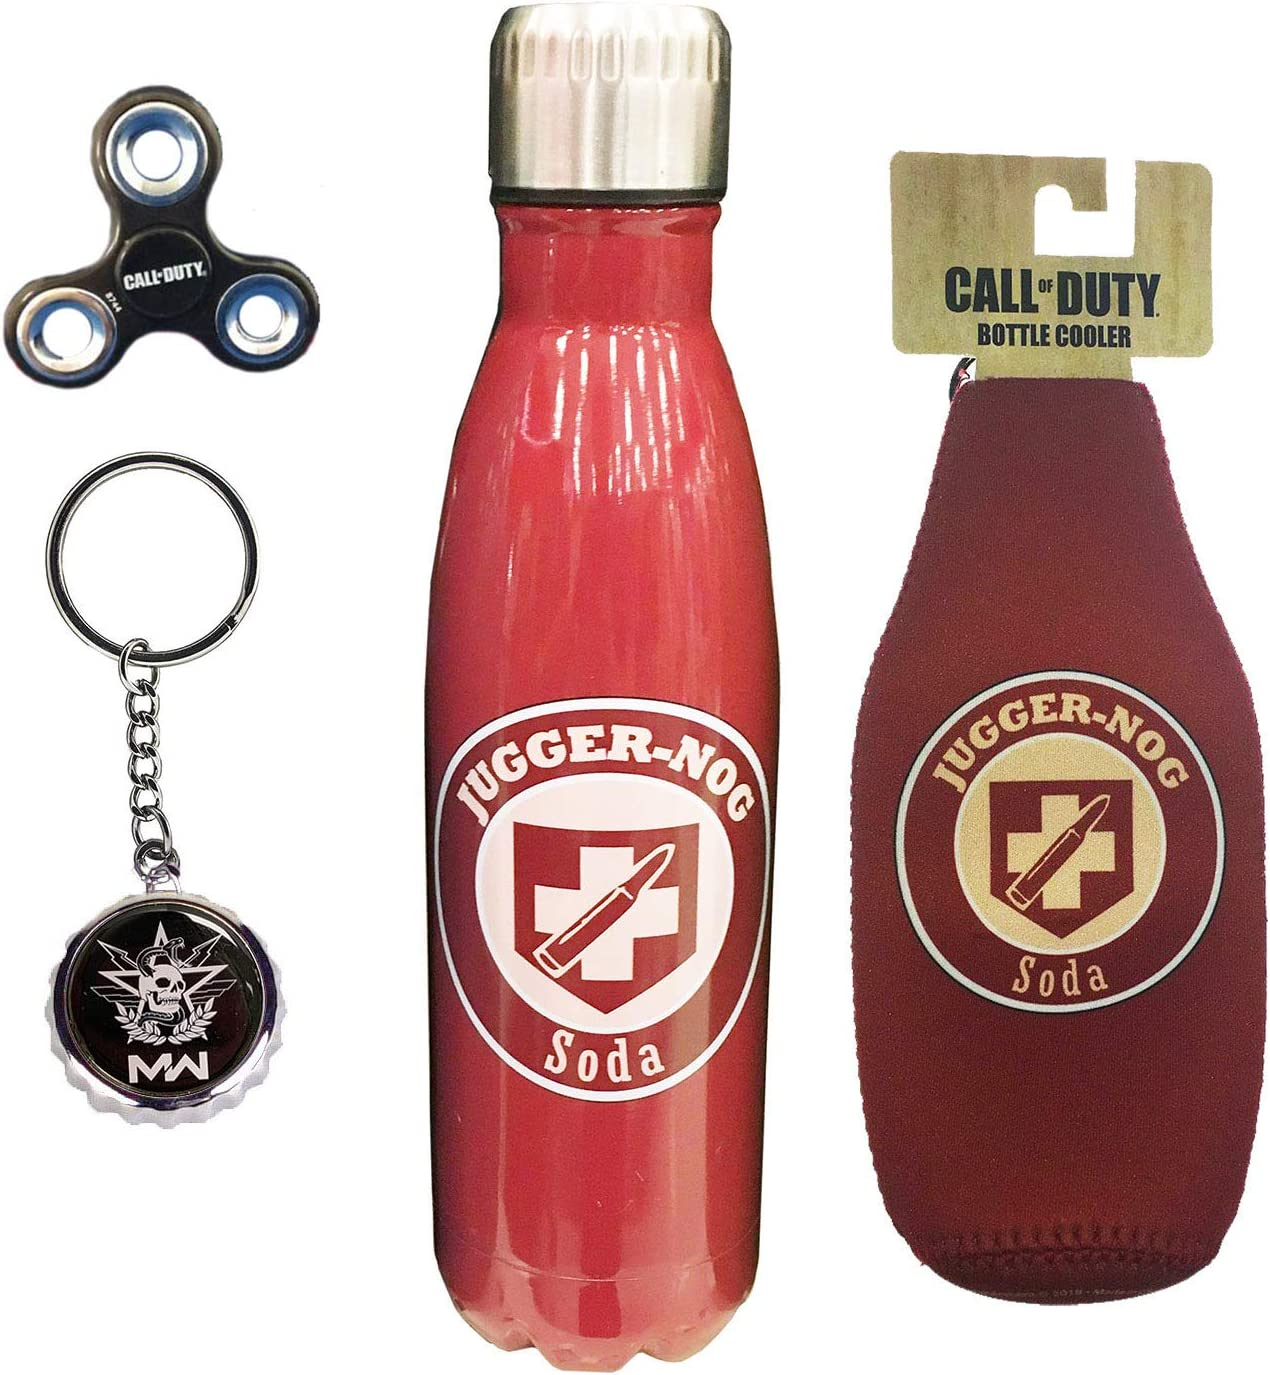 Call of Duty Perks 4 Piece Gift Bundle Water Bottle, Bottle Koozie, Fidget Spiner, East/West Faction Key Chain (Jugger-Nog)